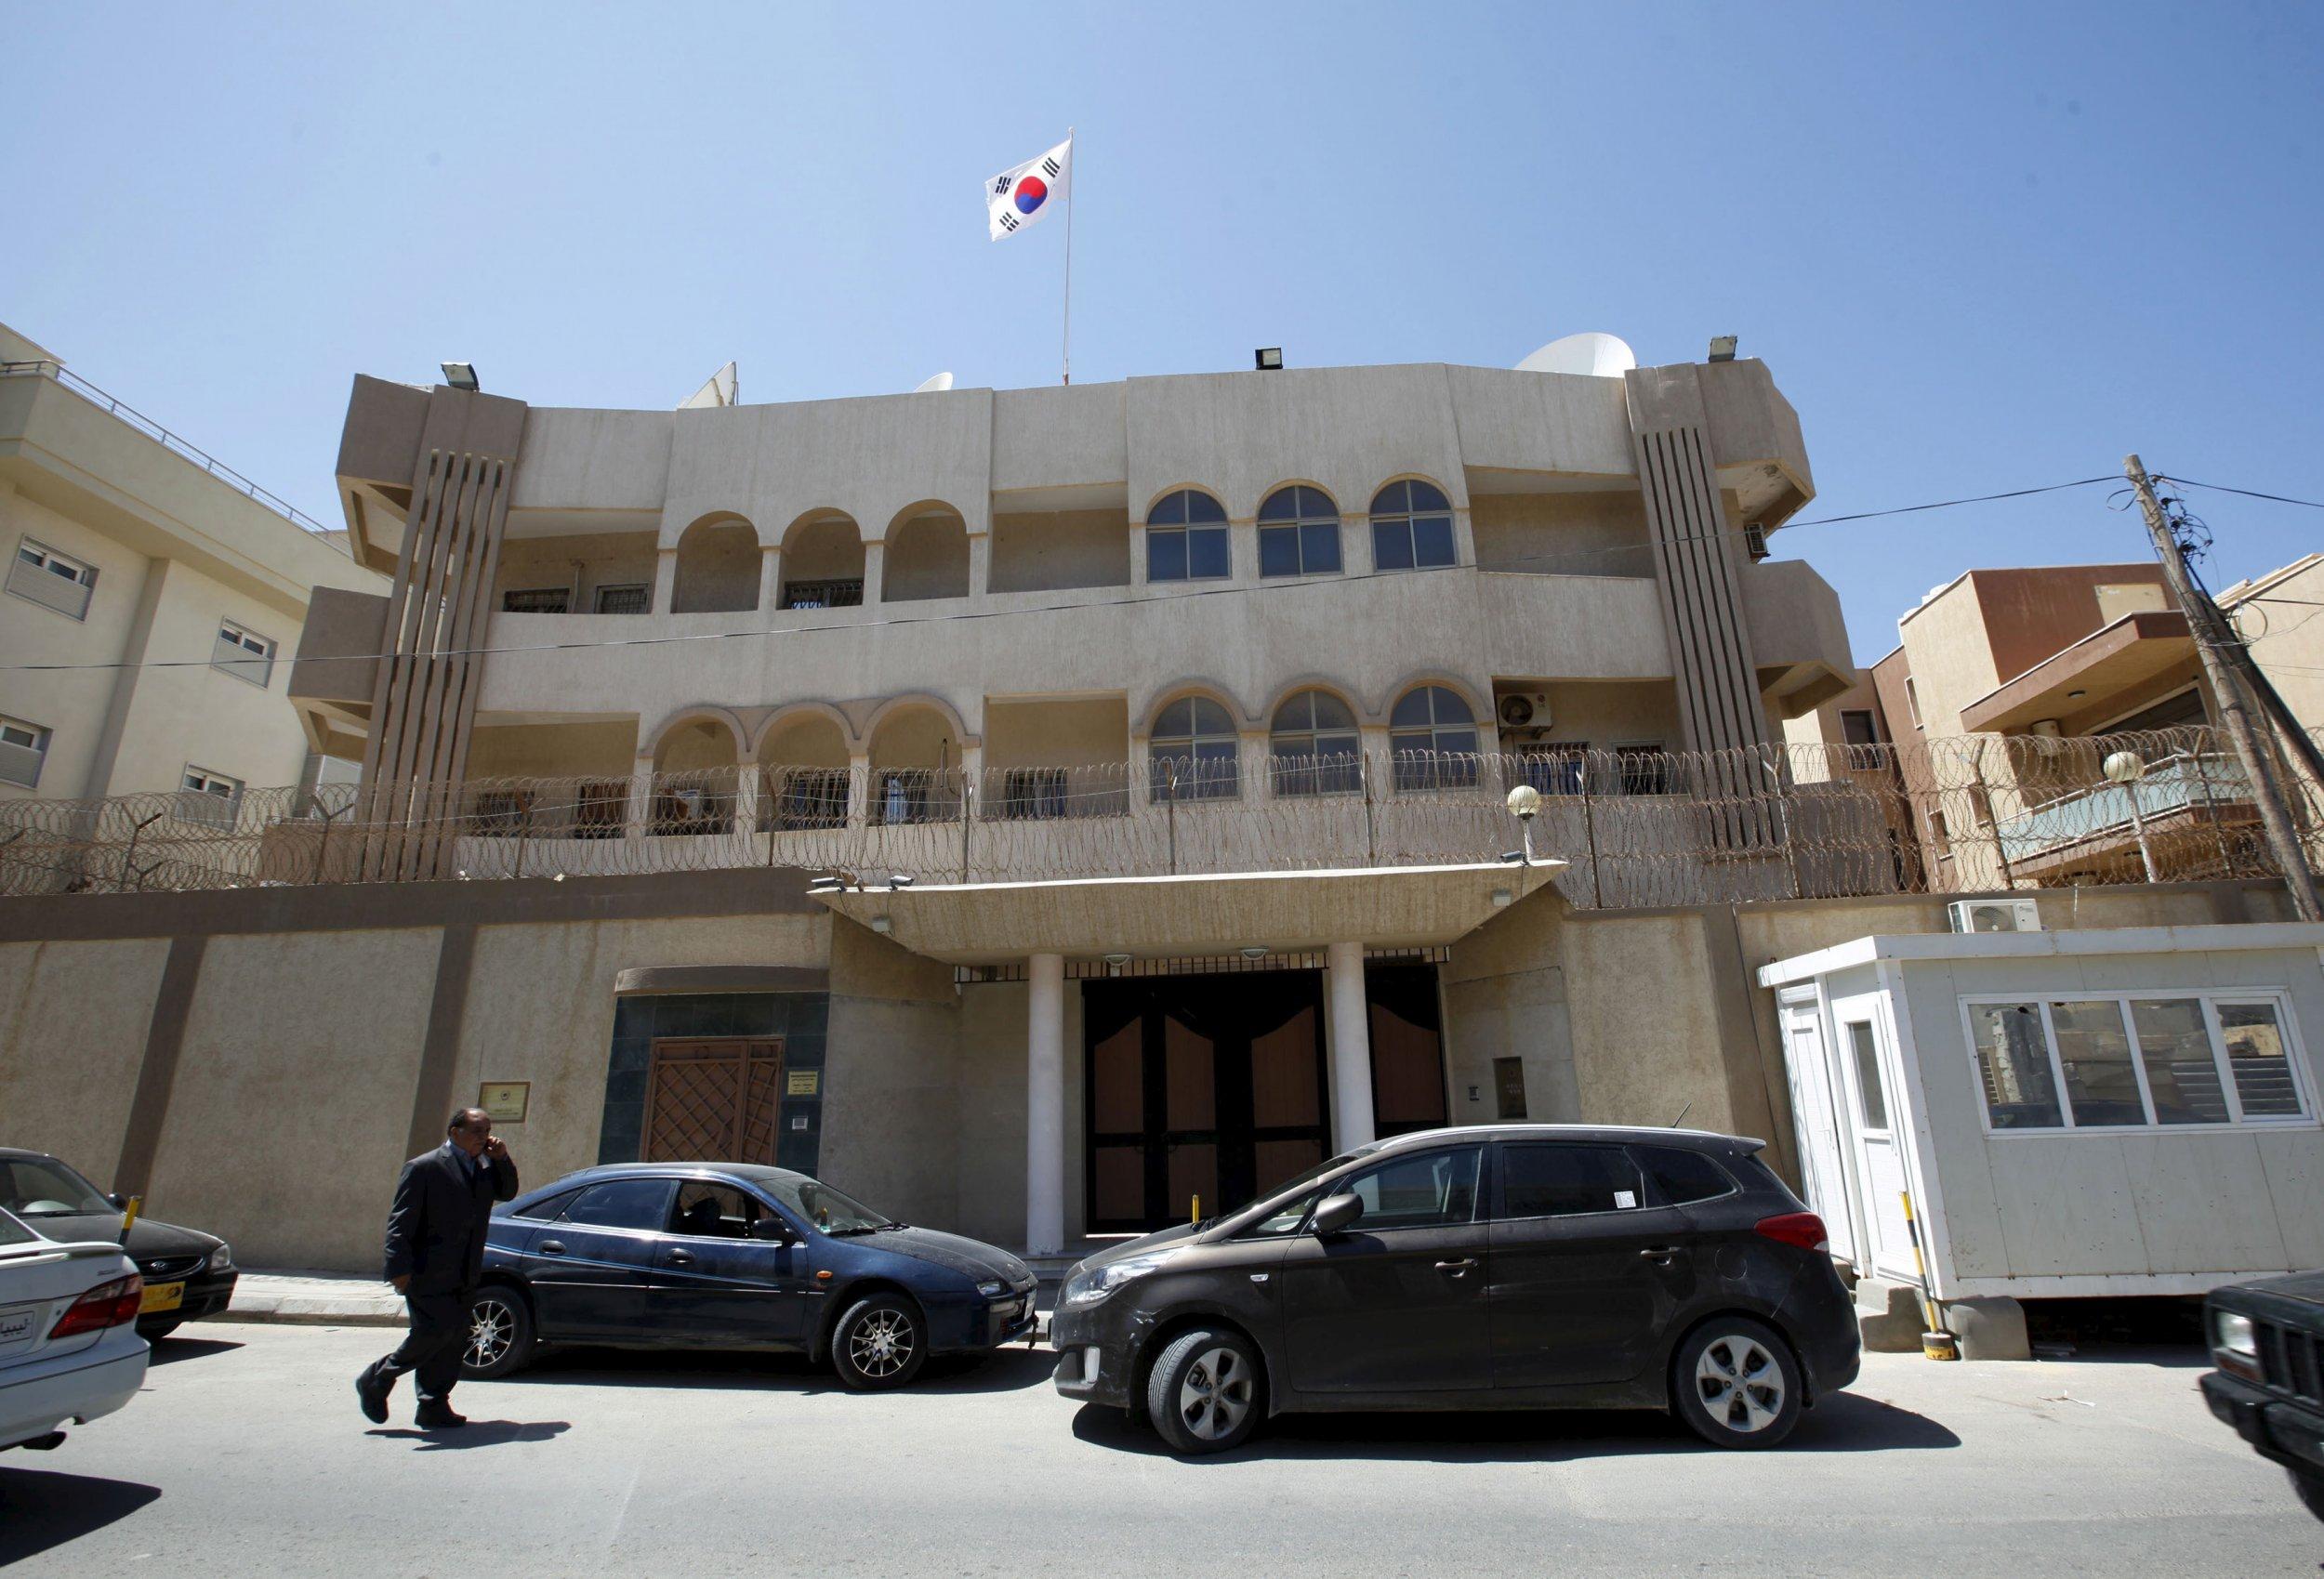 South Korean embassy, Tripoli